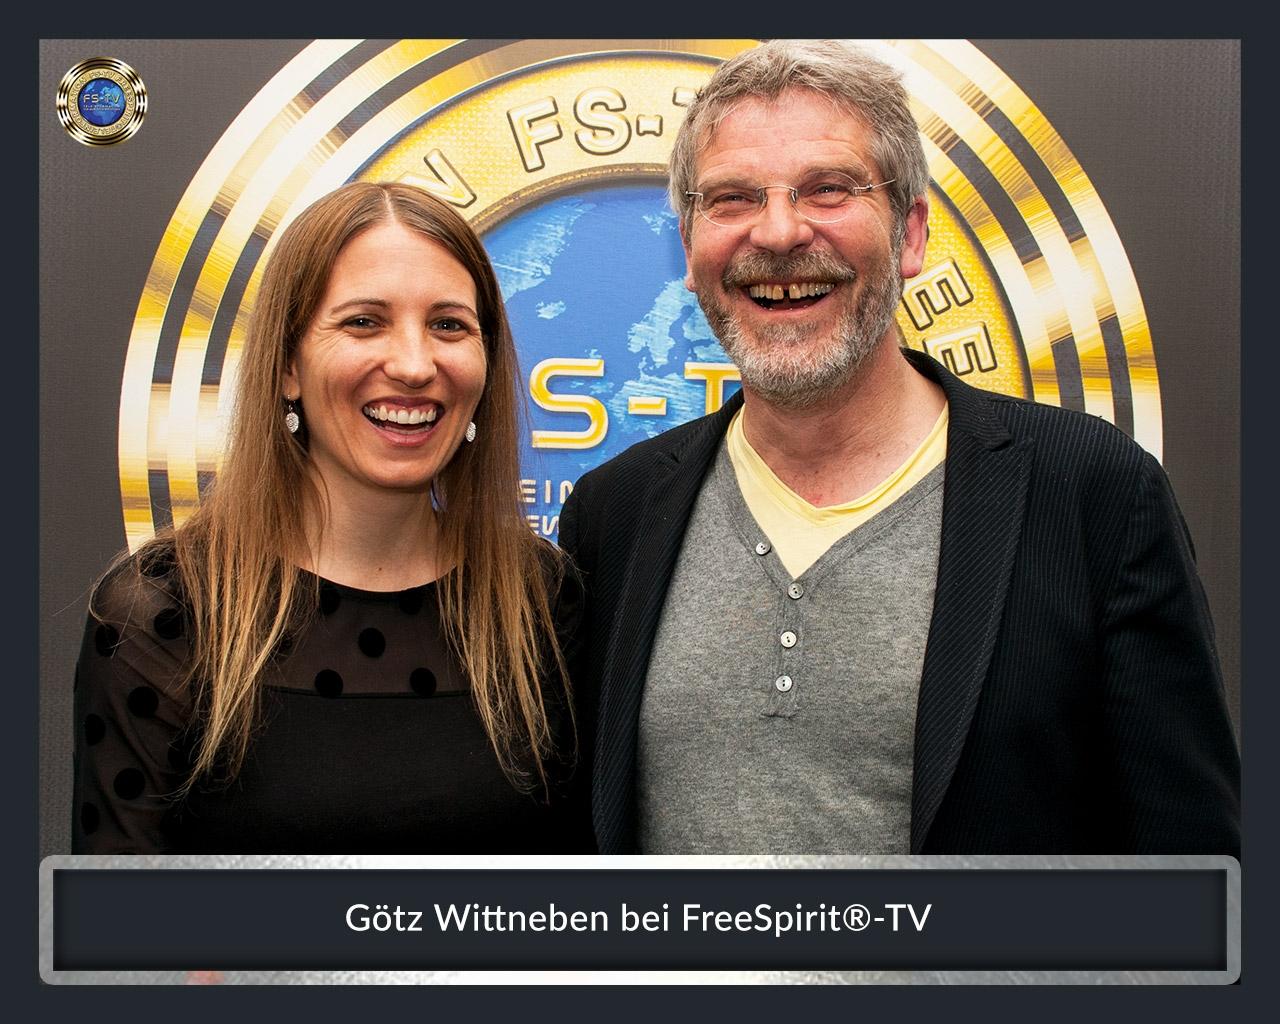 FS-TV-Bildergallerie-Götz-Wittneben-2